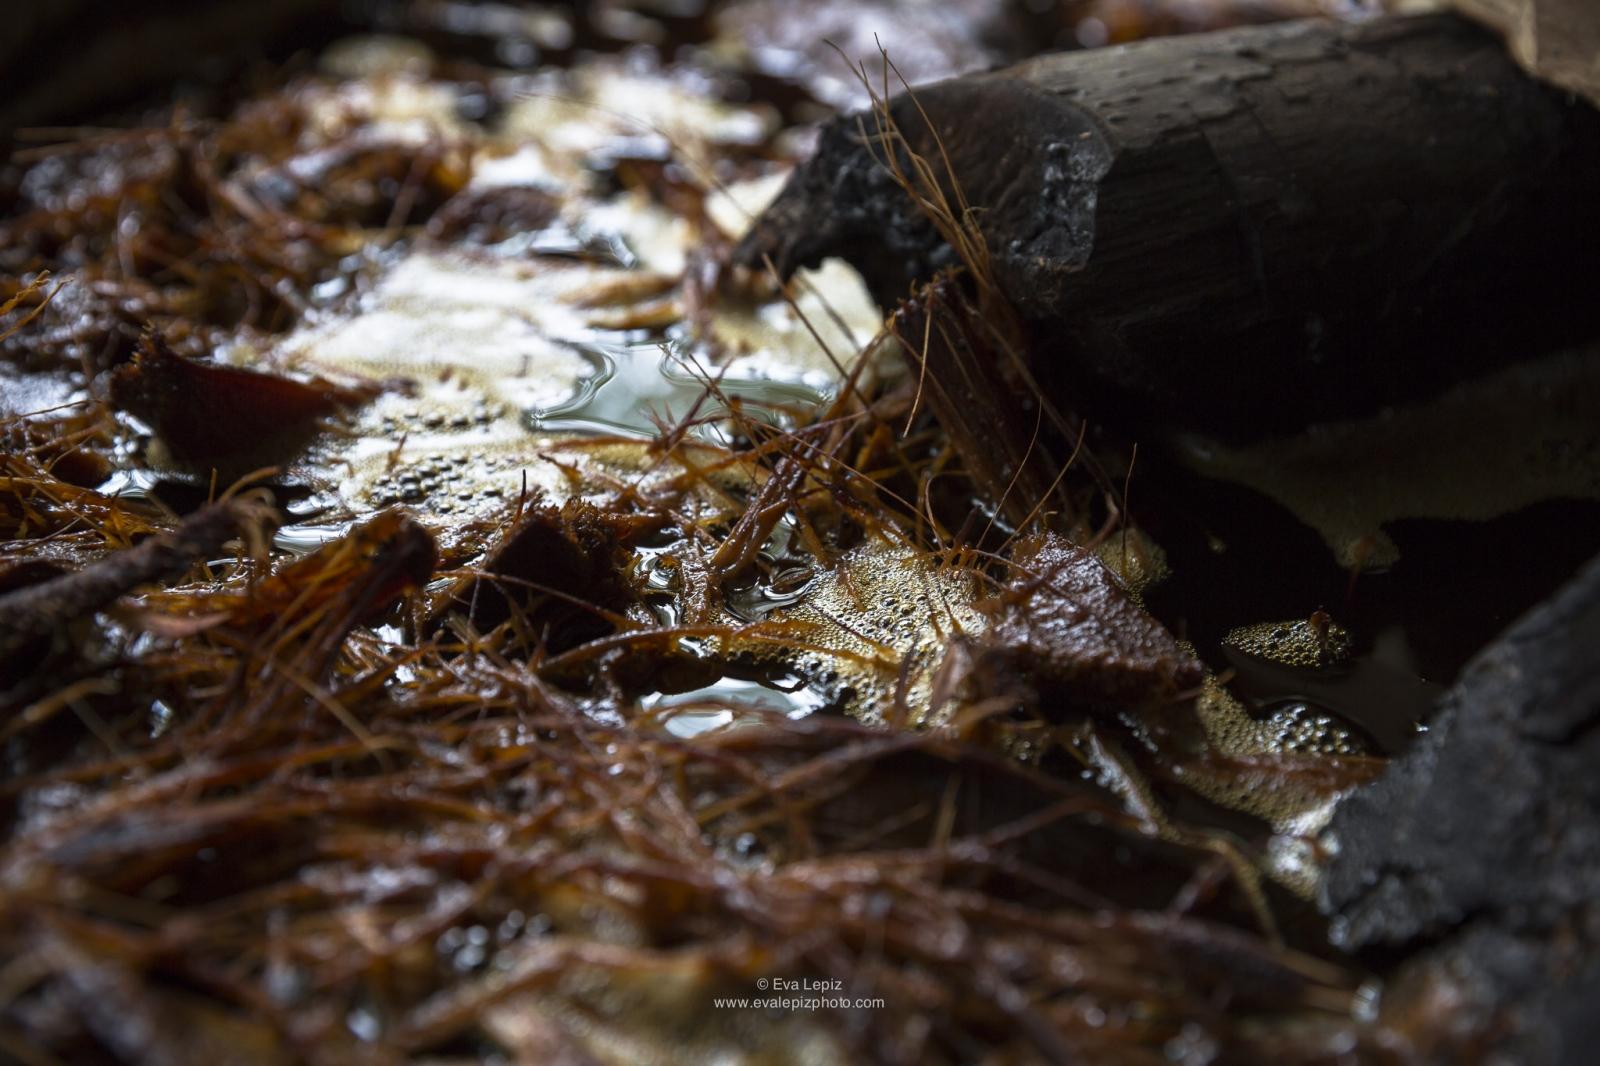 Art and Documentary Photography - Loading MEZCAL_lepiz_003_(1).jpg